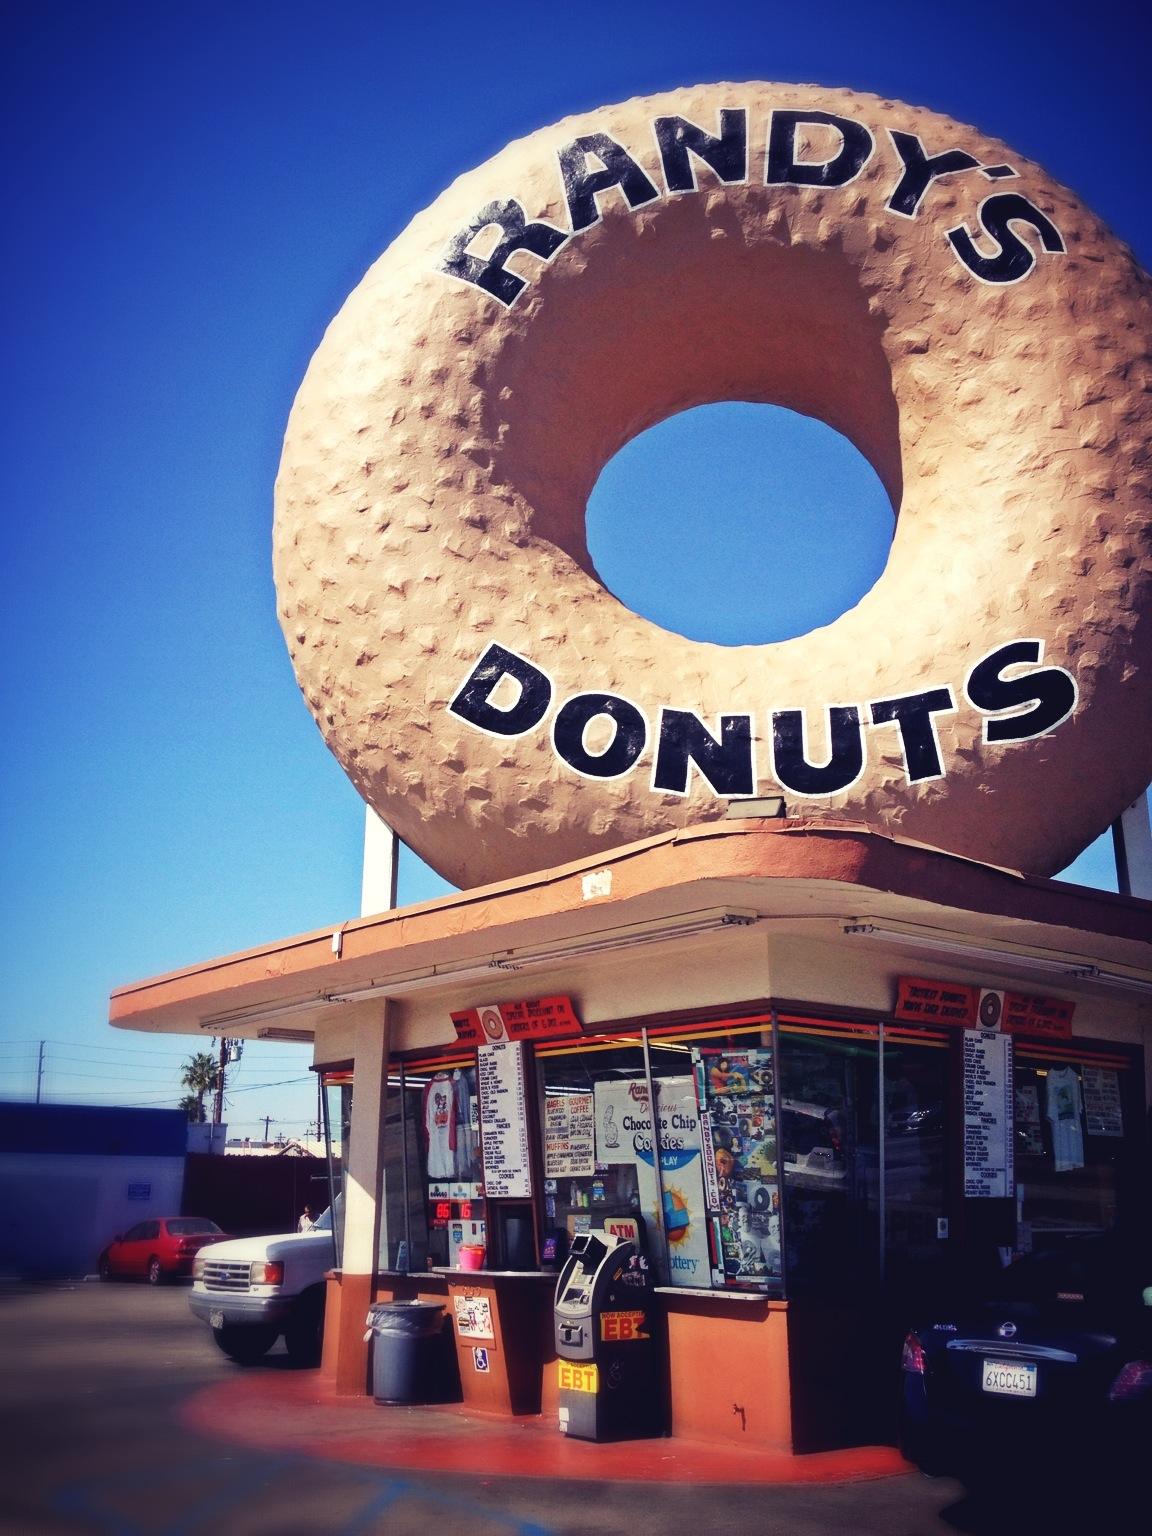 Randys Donuts